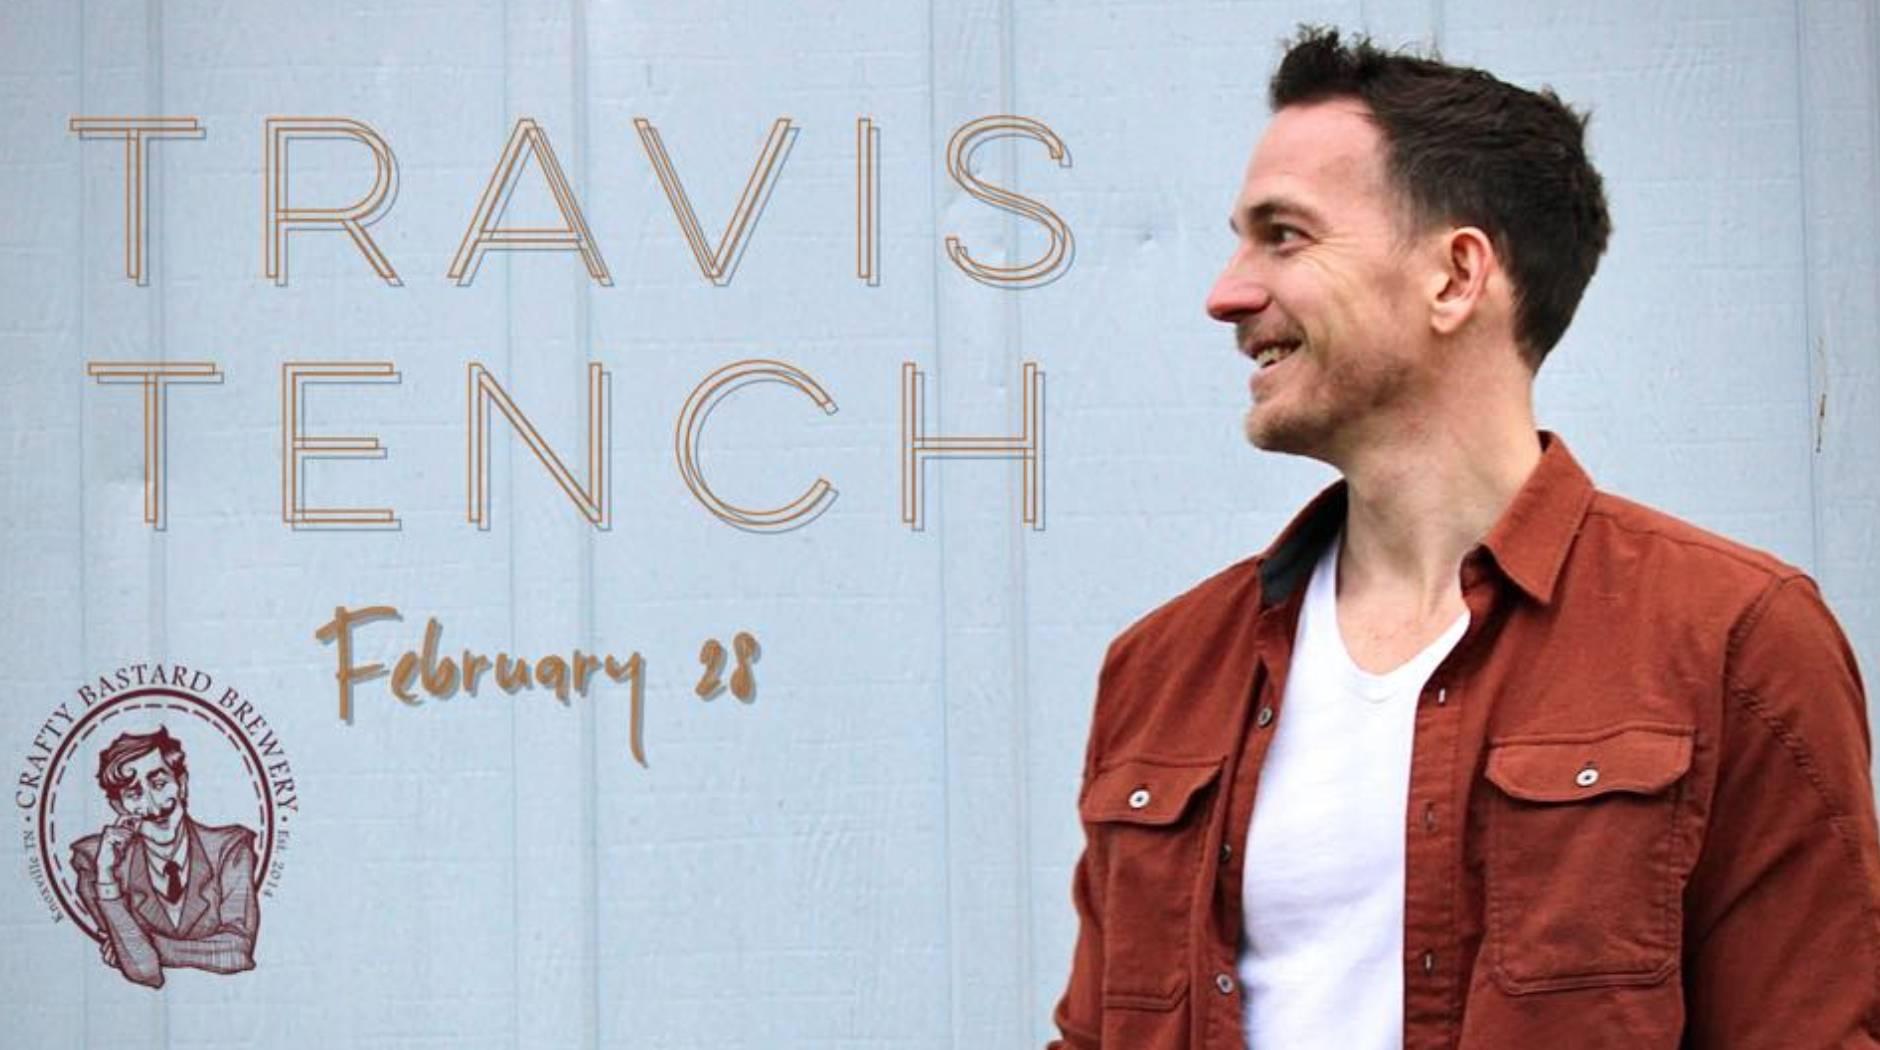 Live Music w/ Travis Tench